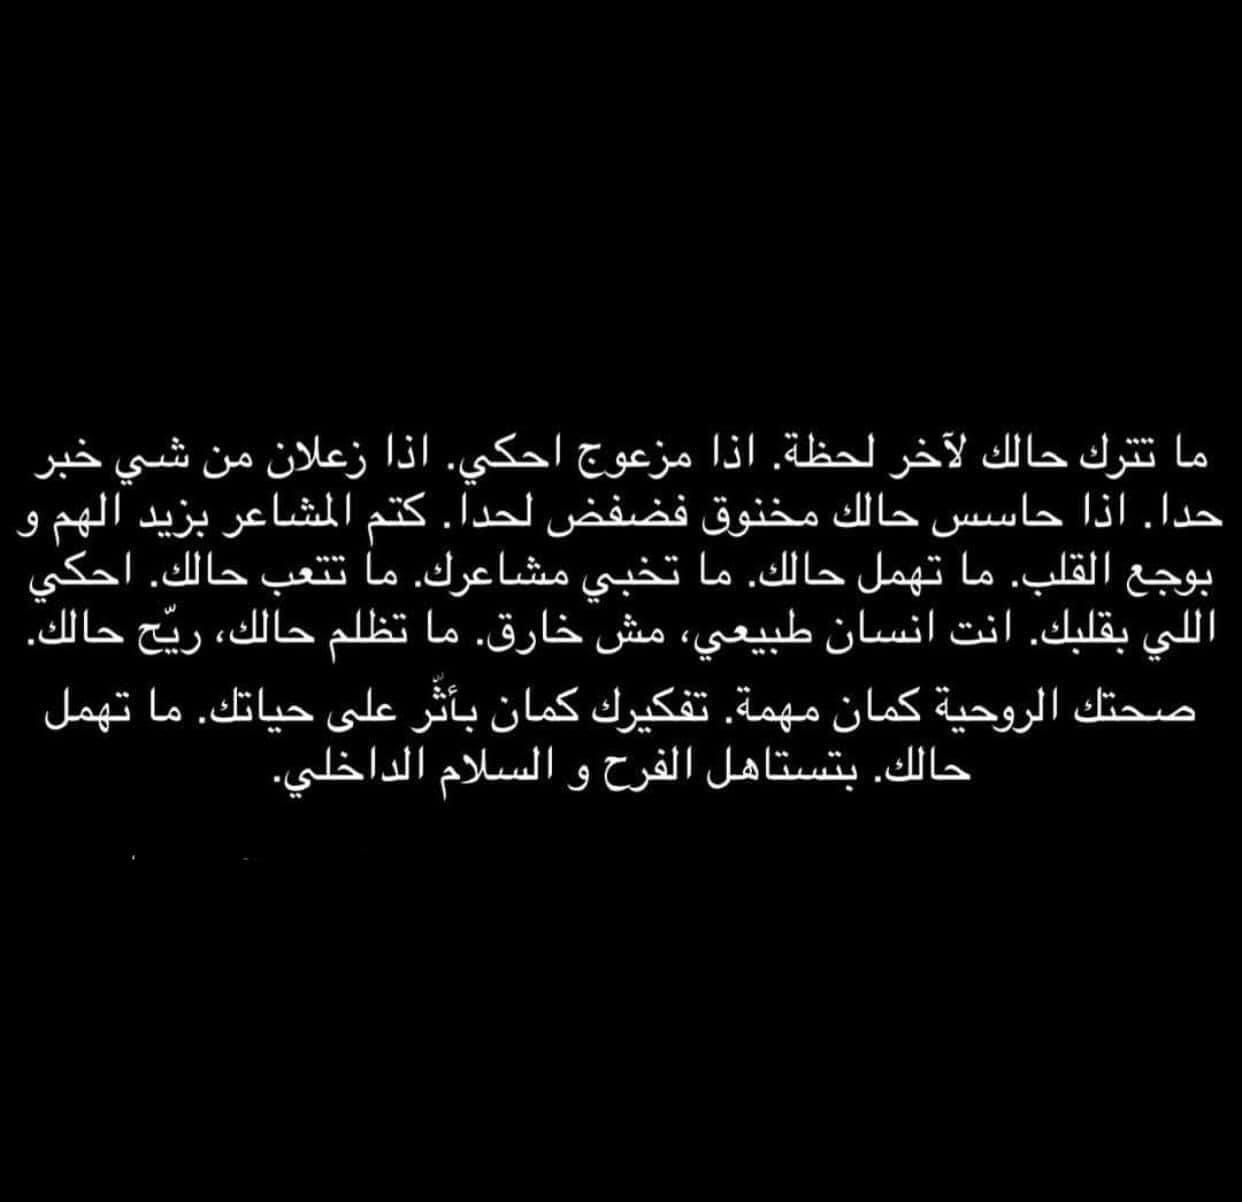 Pin By Merna Assaf On Kitabat Words Words Lockscreen Screenshot Weather Screenshot